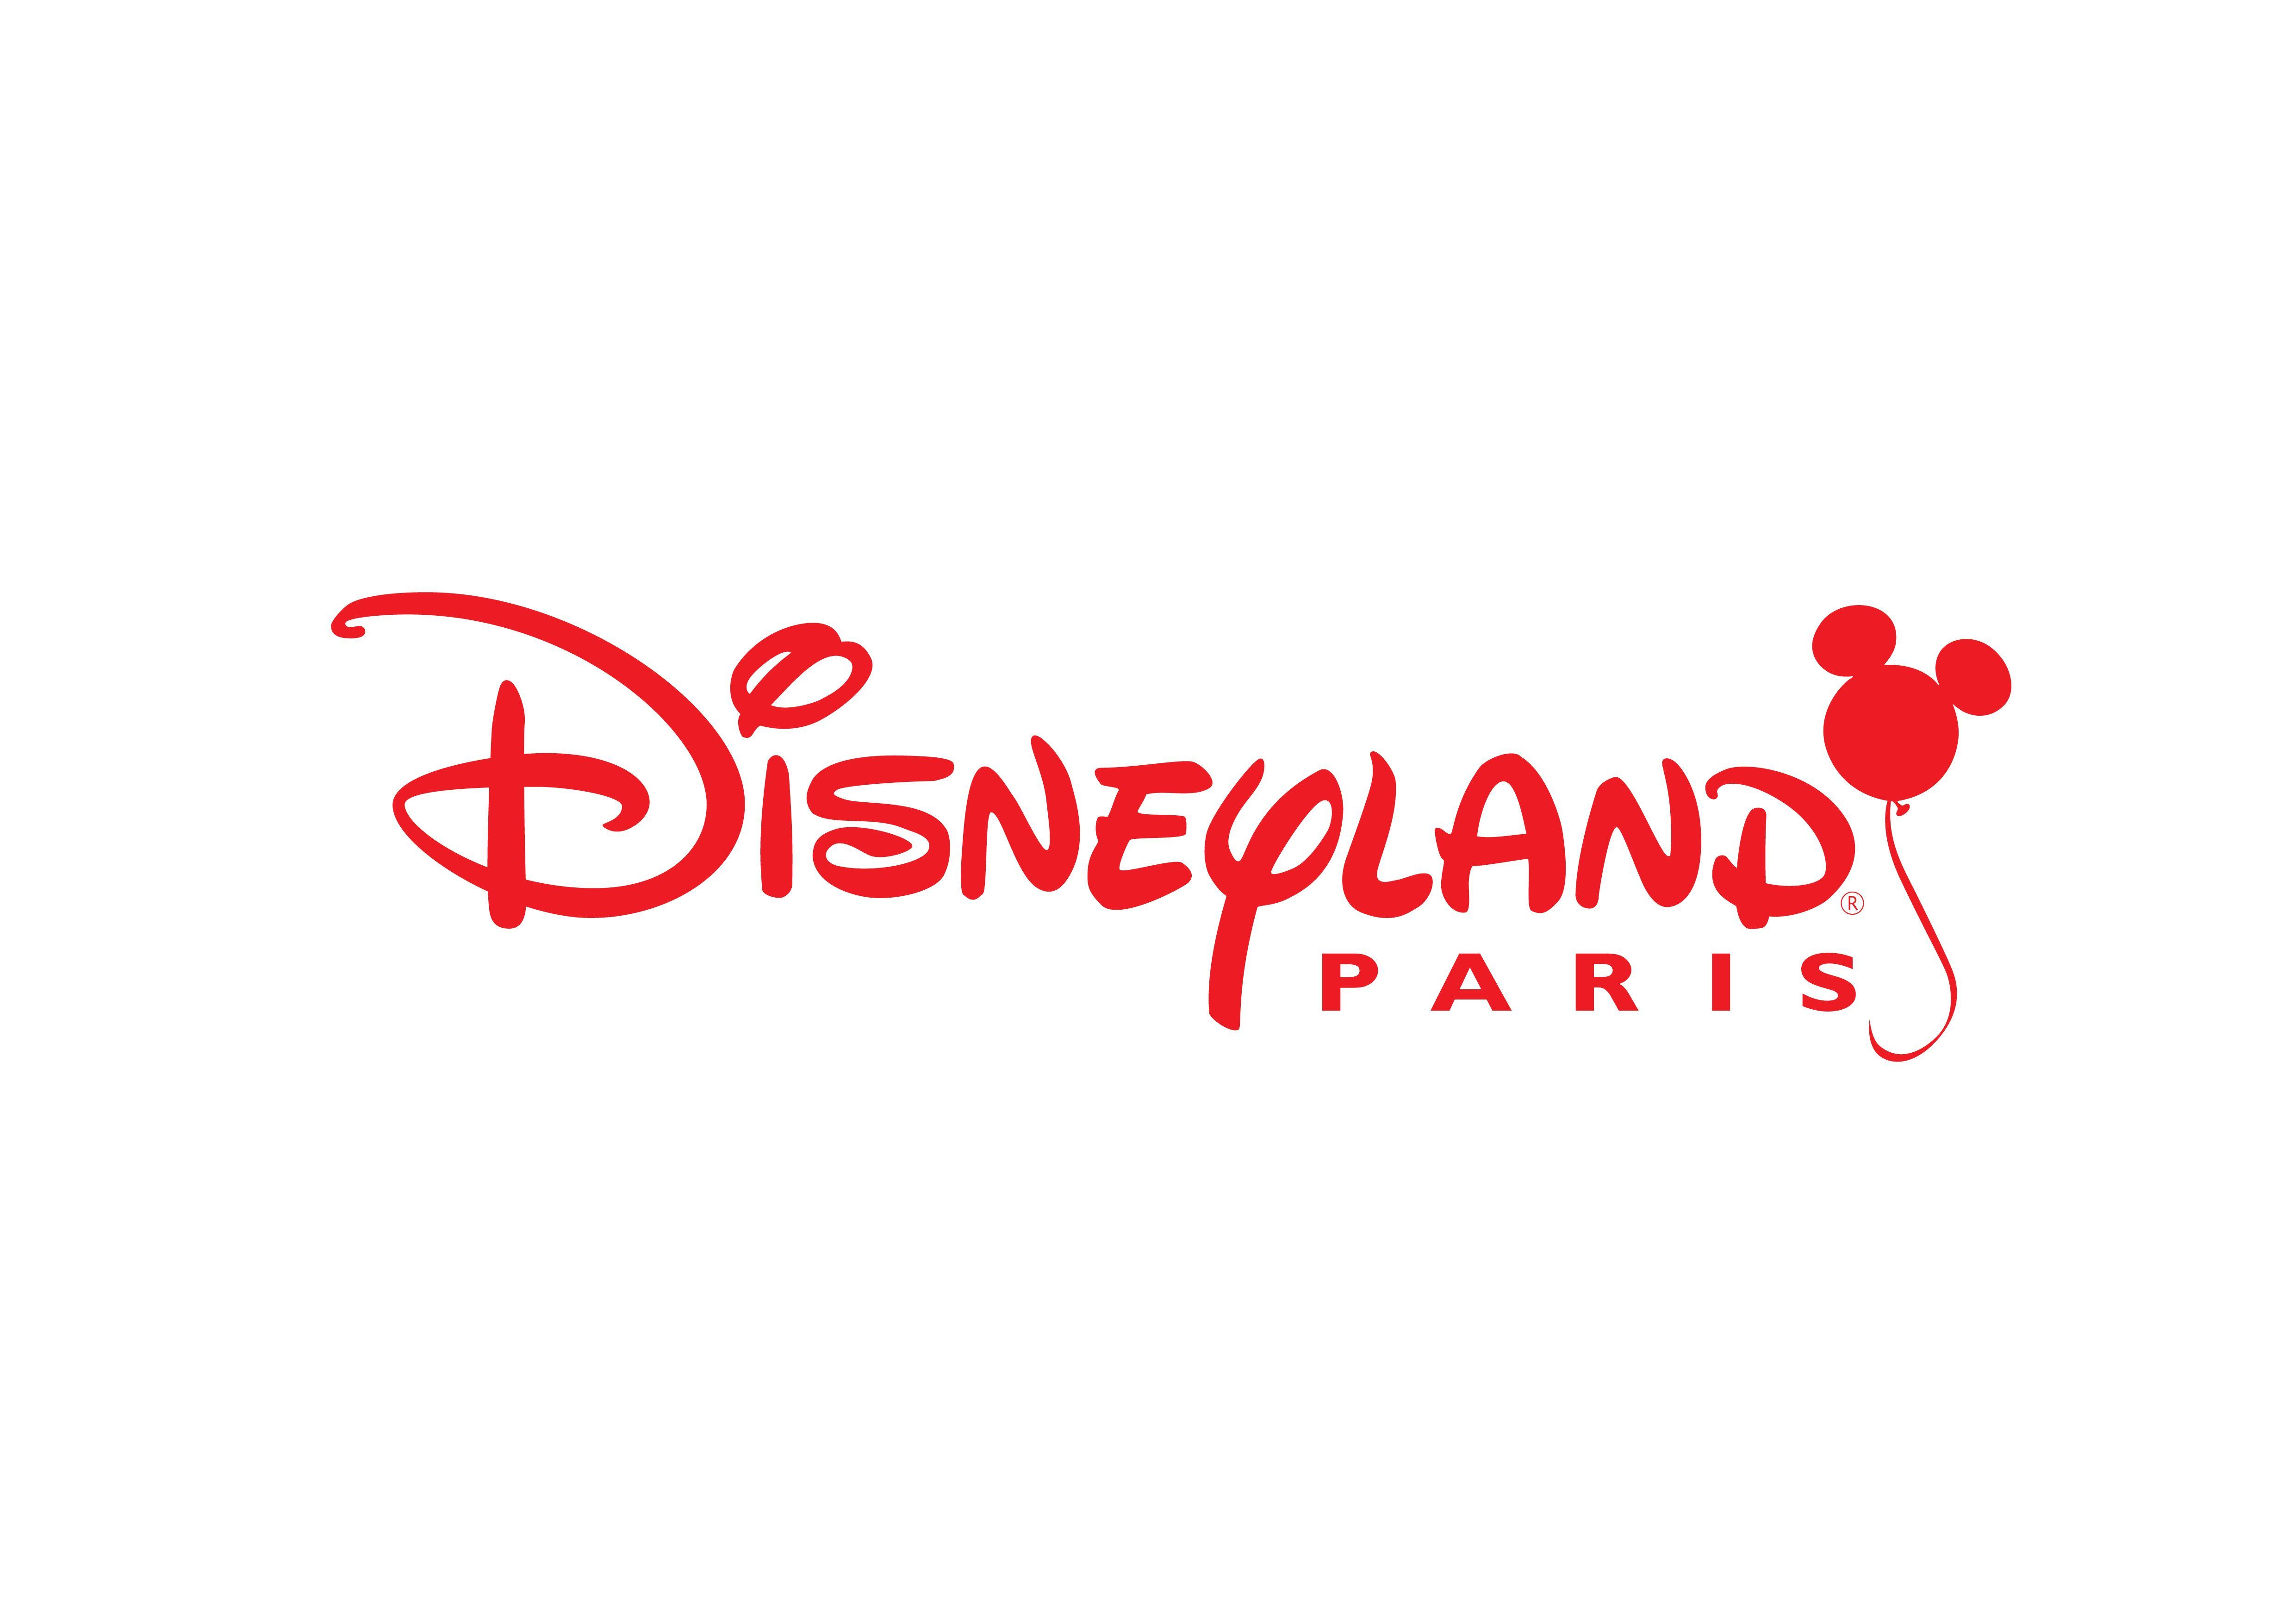 Disneyland Paris Logo | ★ Disney ★ | Pinterest